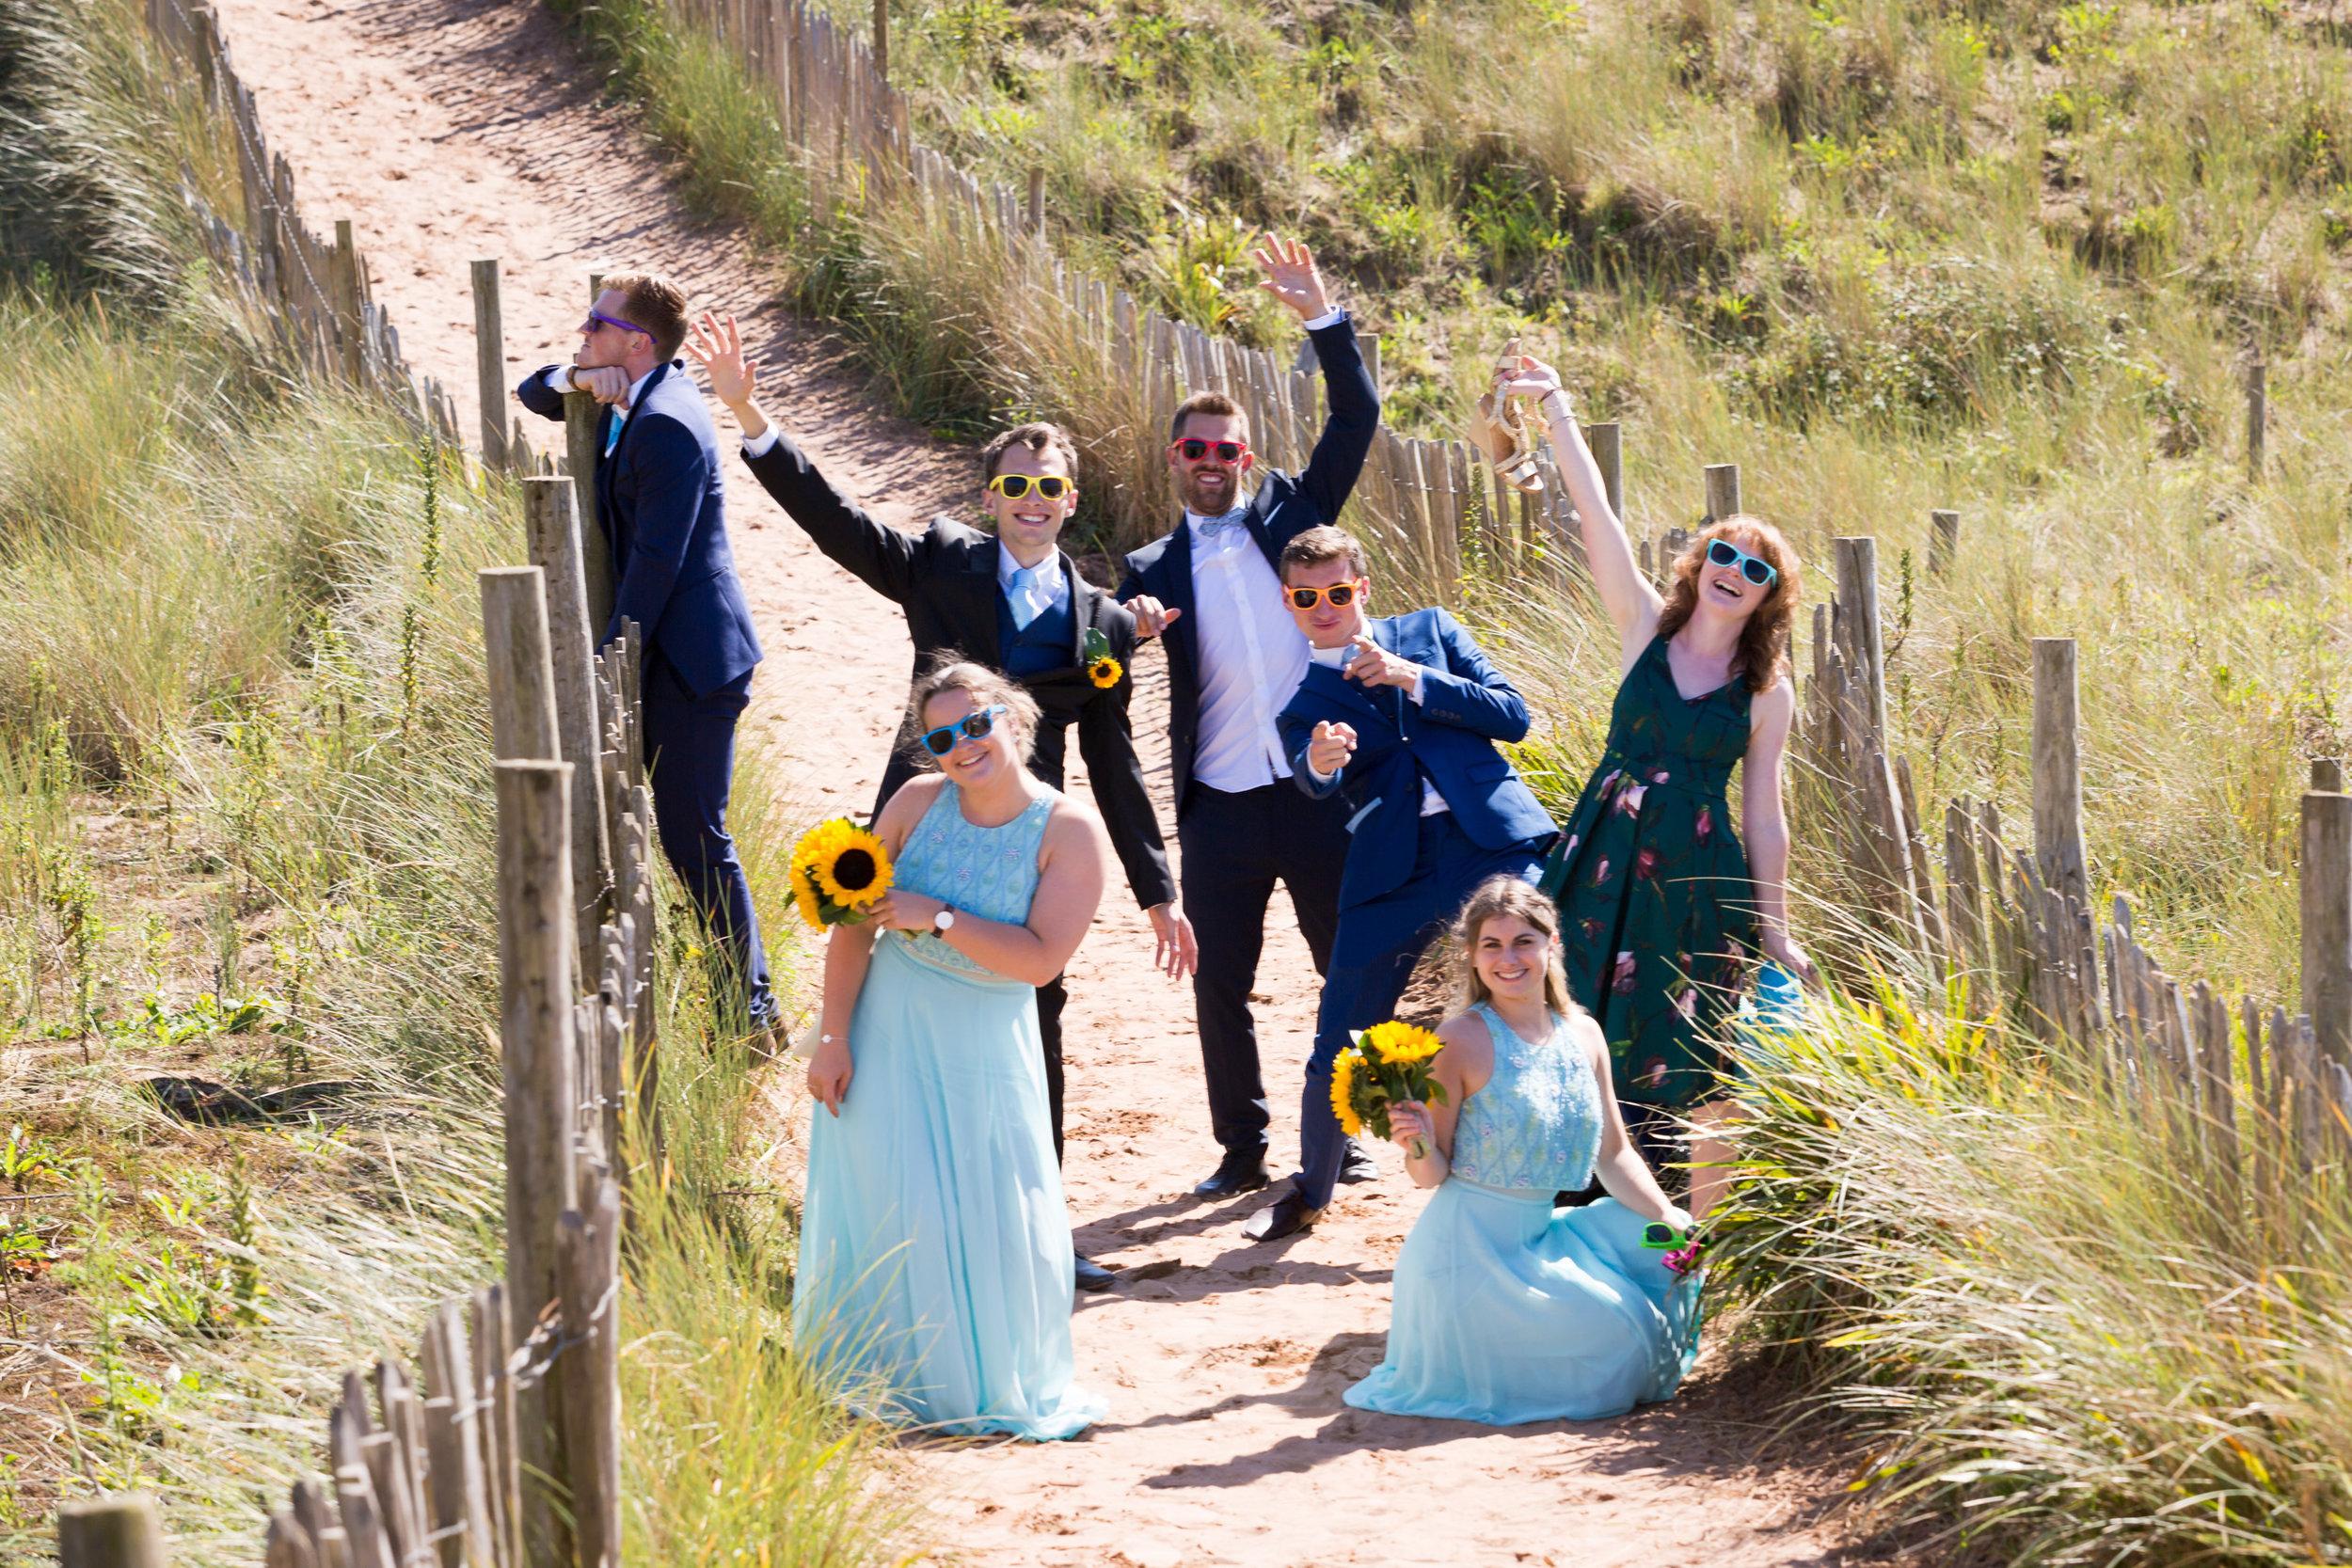 Bucklands-Tout-Saints-Hotel-Devon-Wedding-Photography-20.jpg